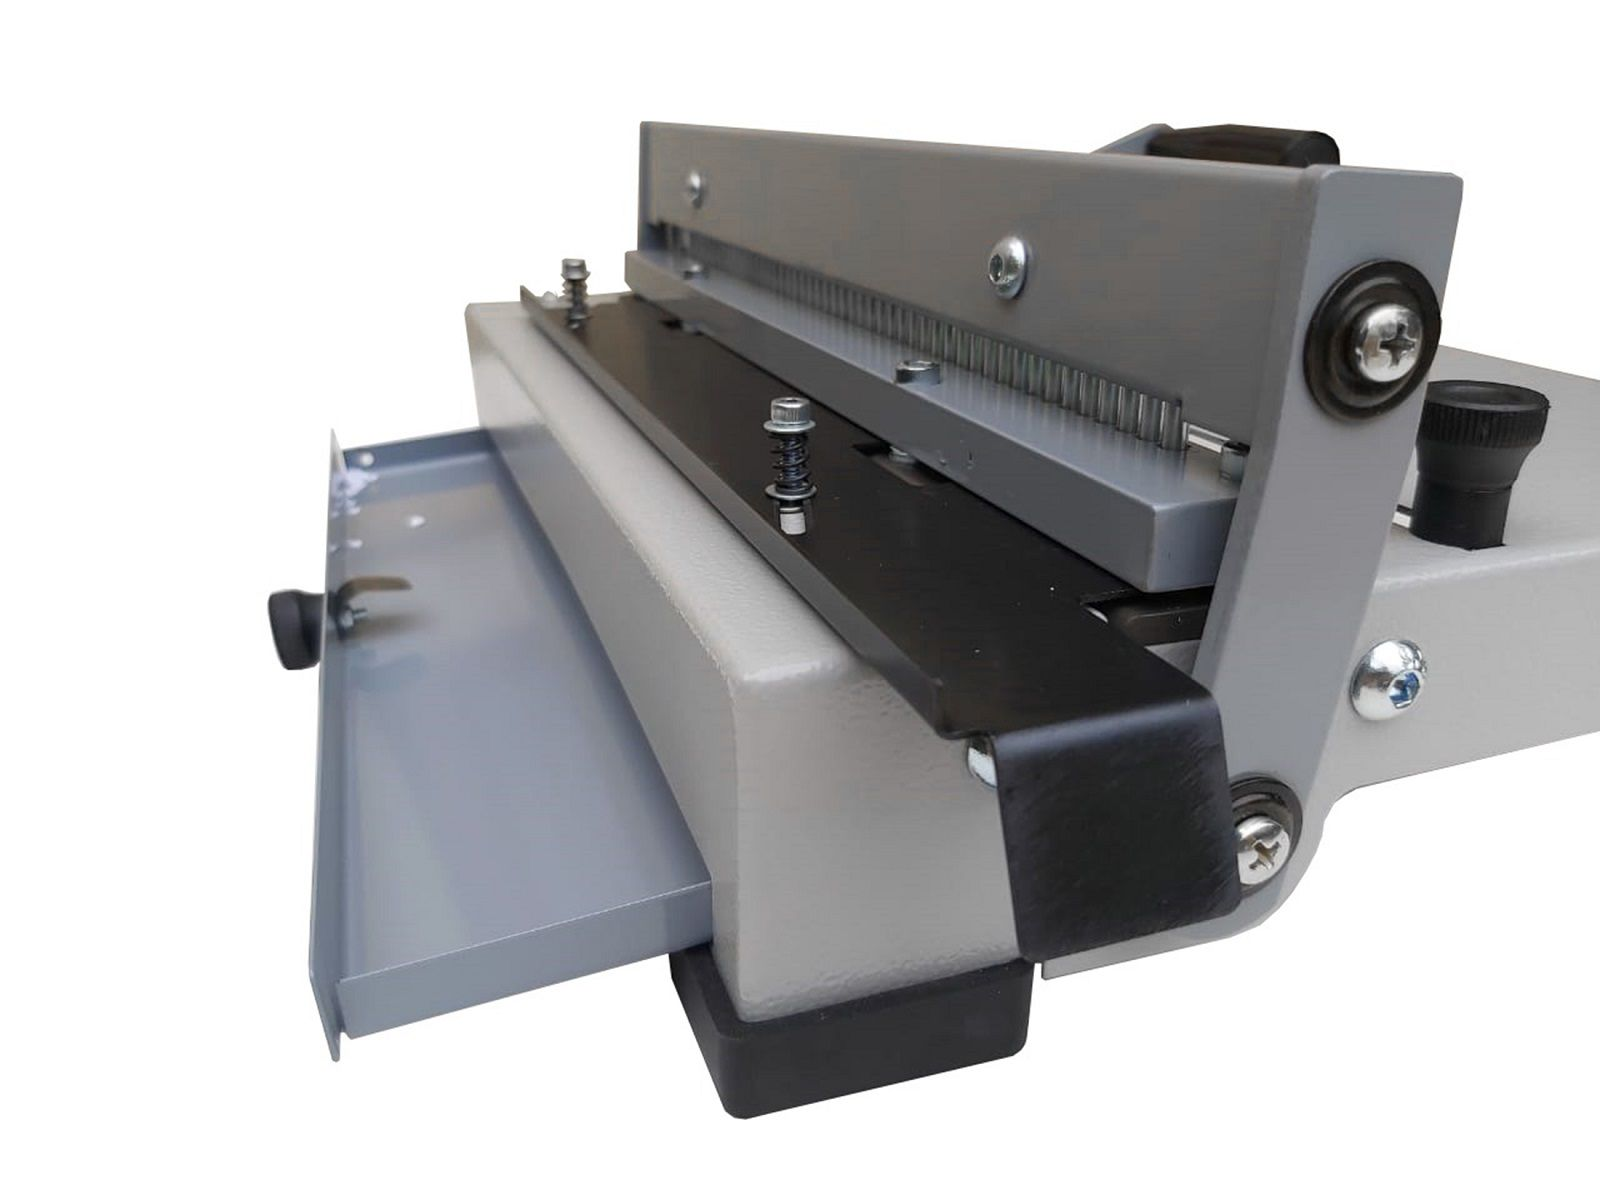 Kit Encadernadora A4 + 200 Capas e 100 Espirais de 07mm Preto  - Click Suprimentos